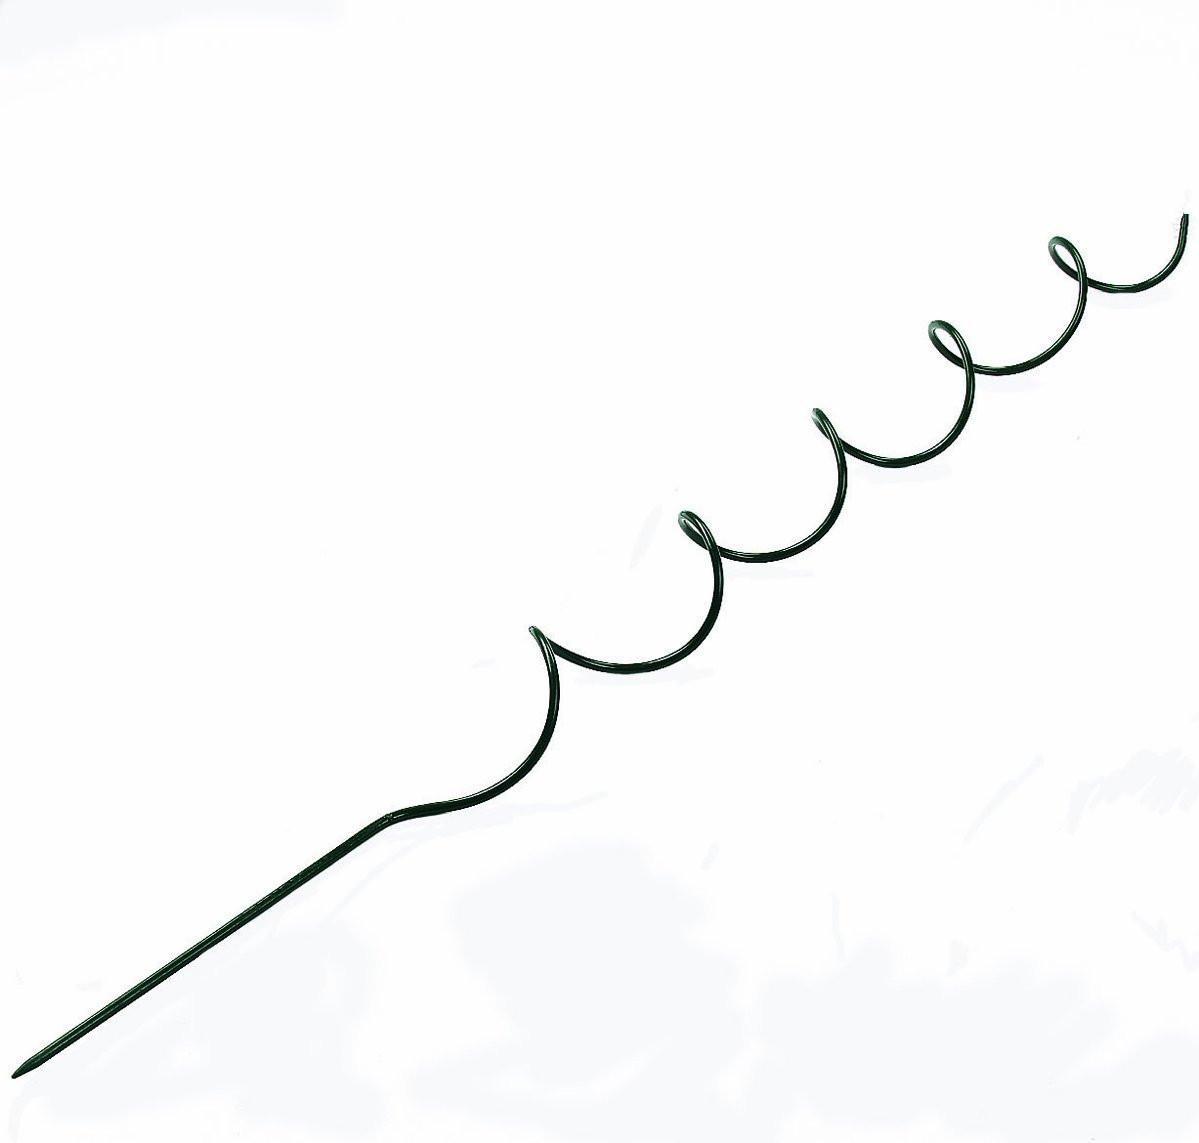 kroucené tyčky na rajčata - sada 4 kusů 6 mm x 180 cm